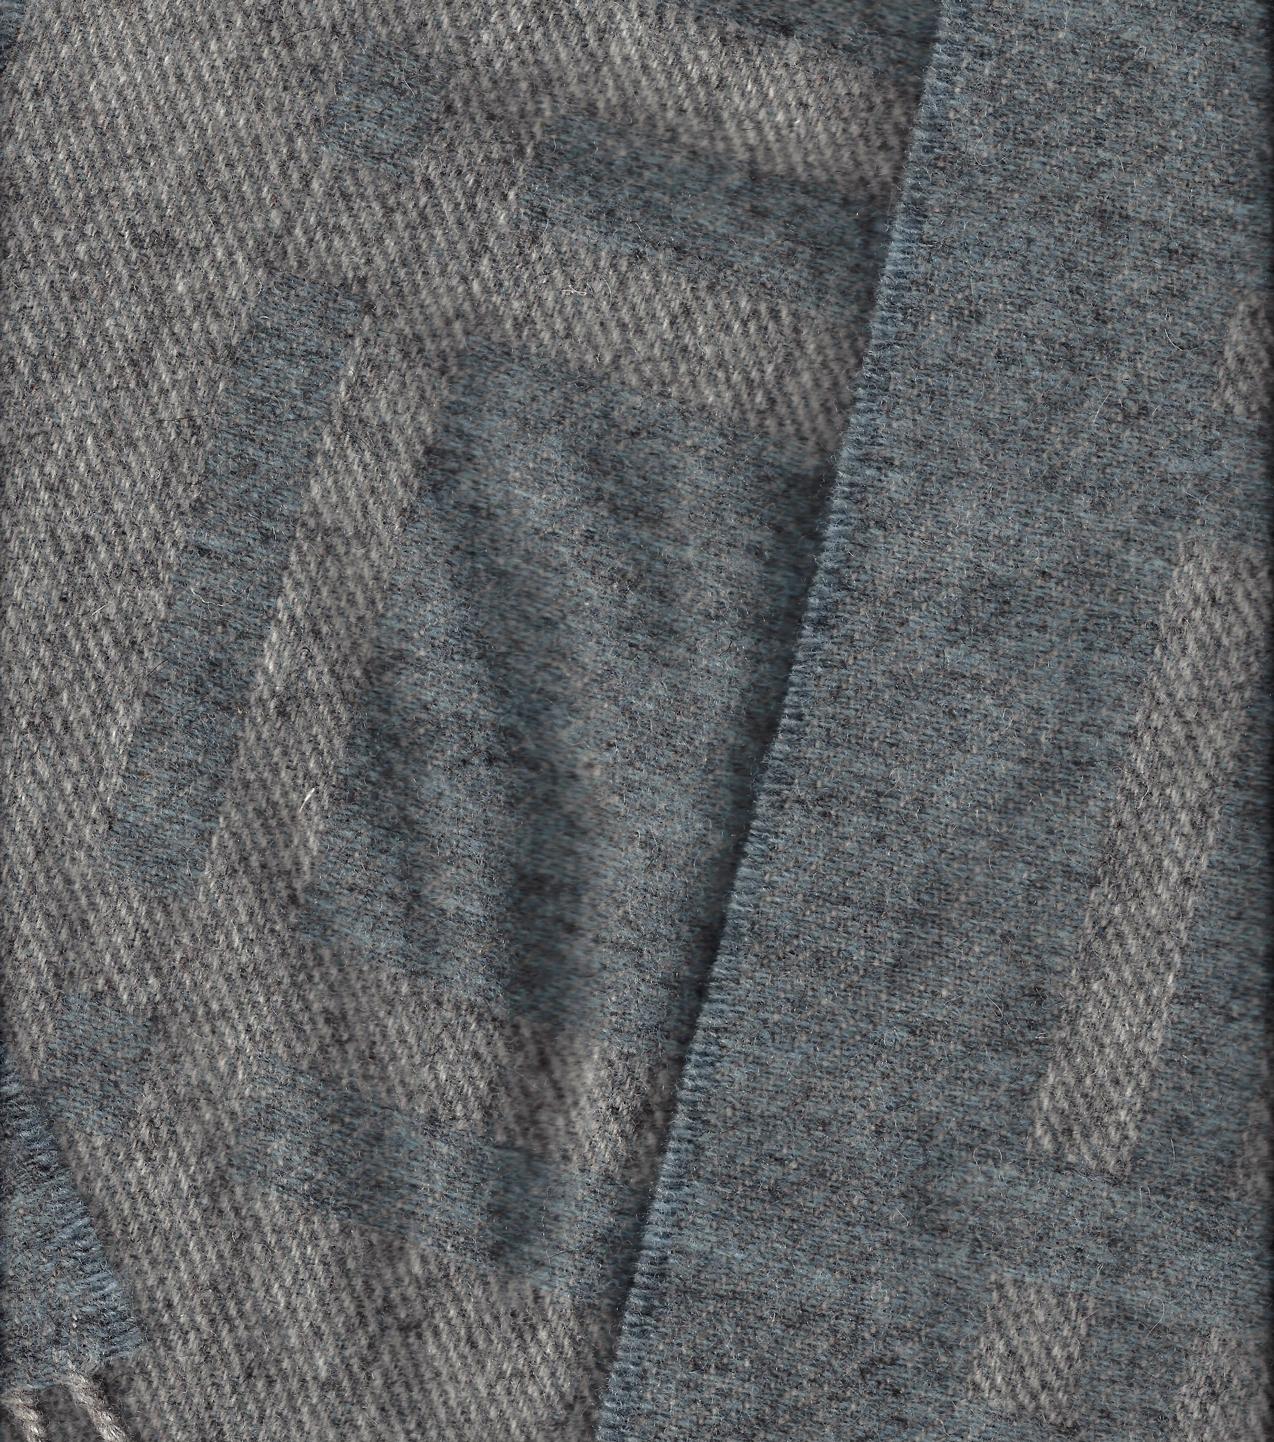 Laura's Loom, Cumbrian Summer Blanket, Ocean, wool, British